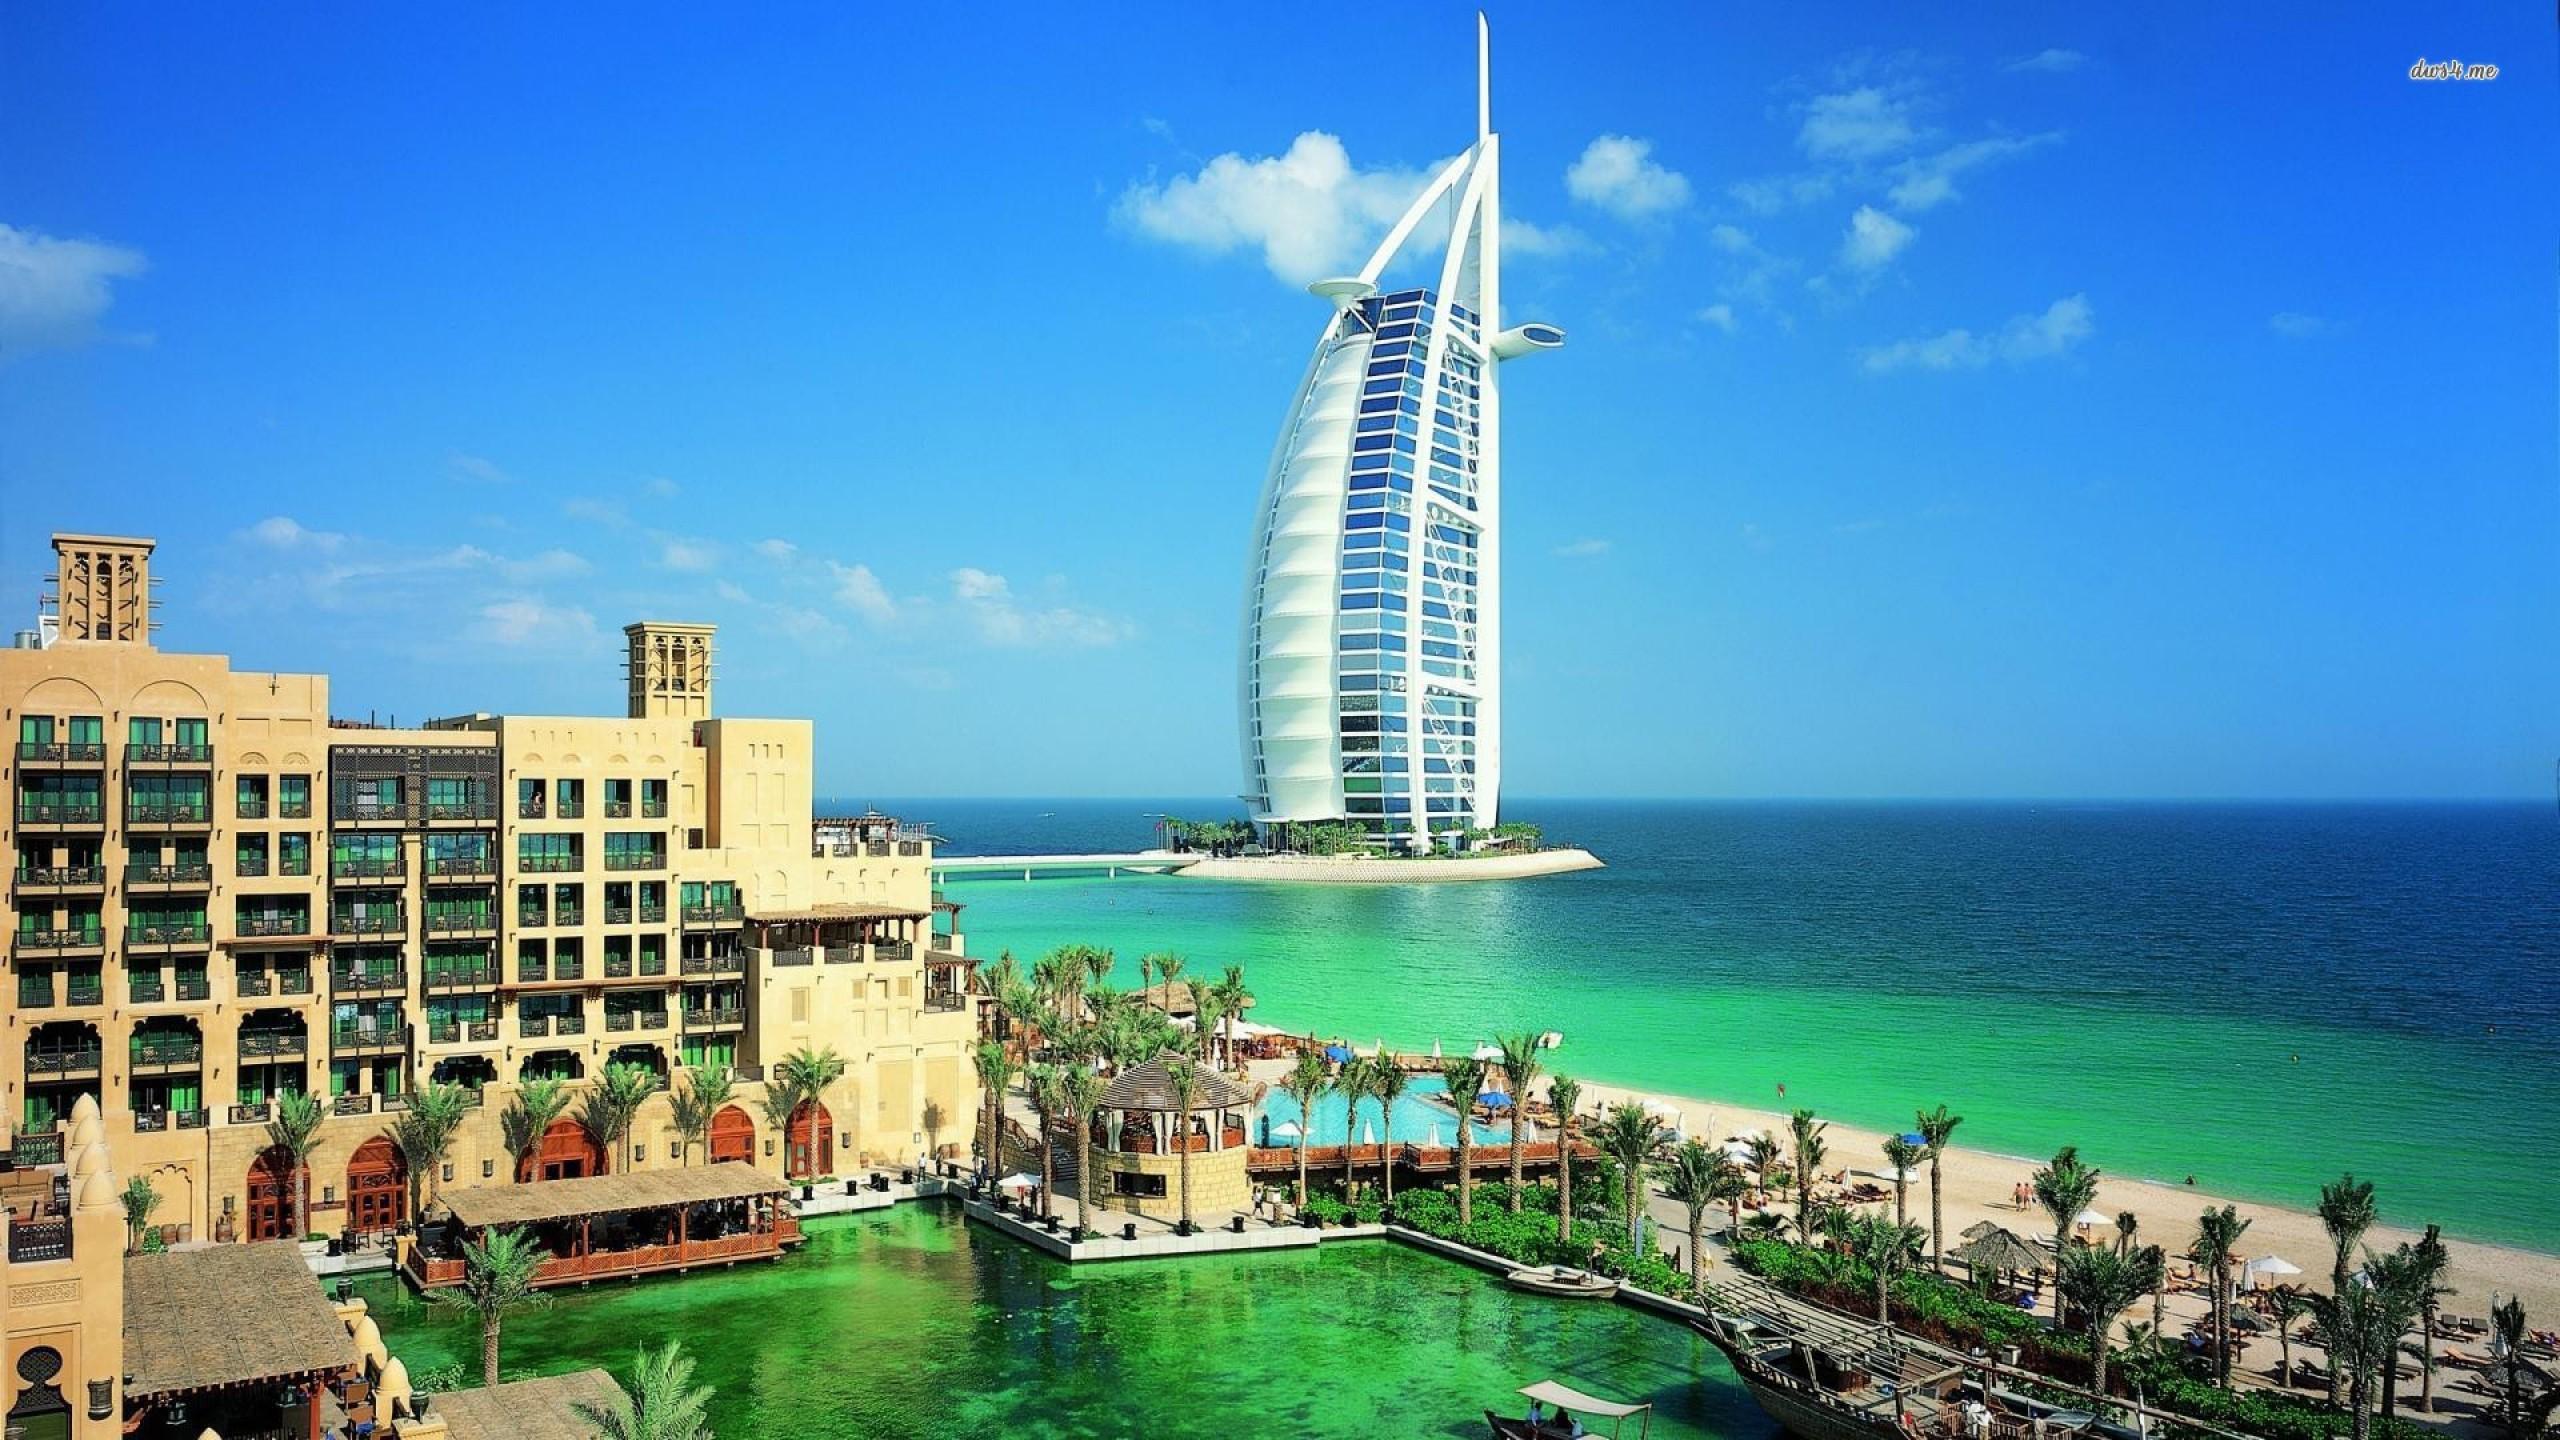 Burj Al Arab Pictures